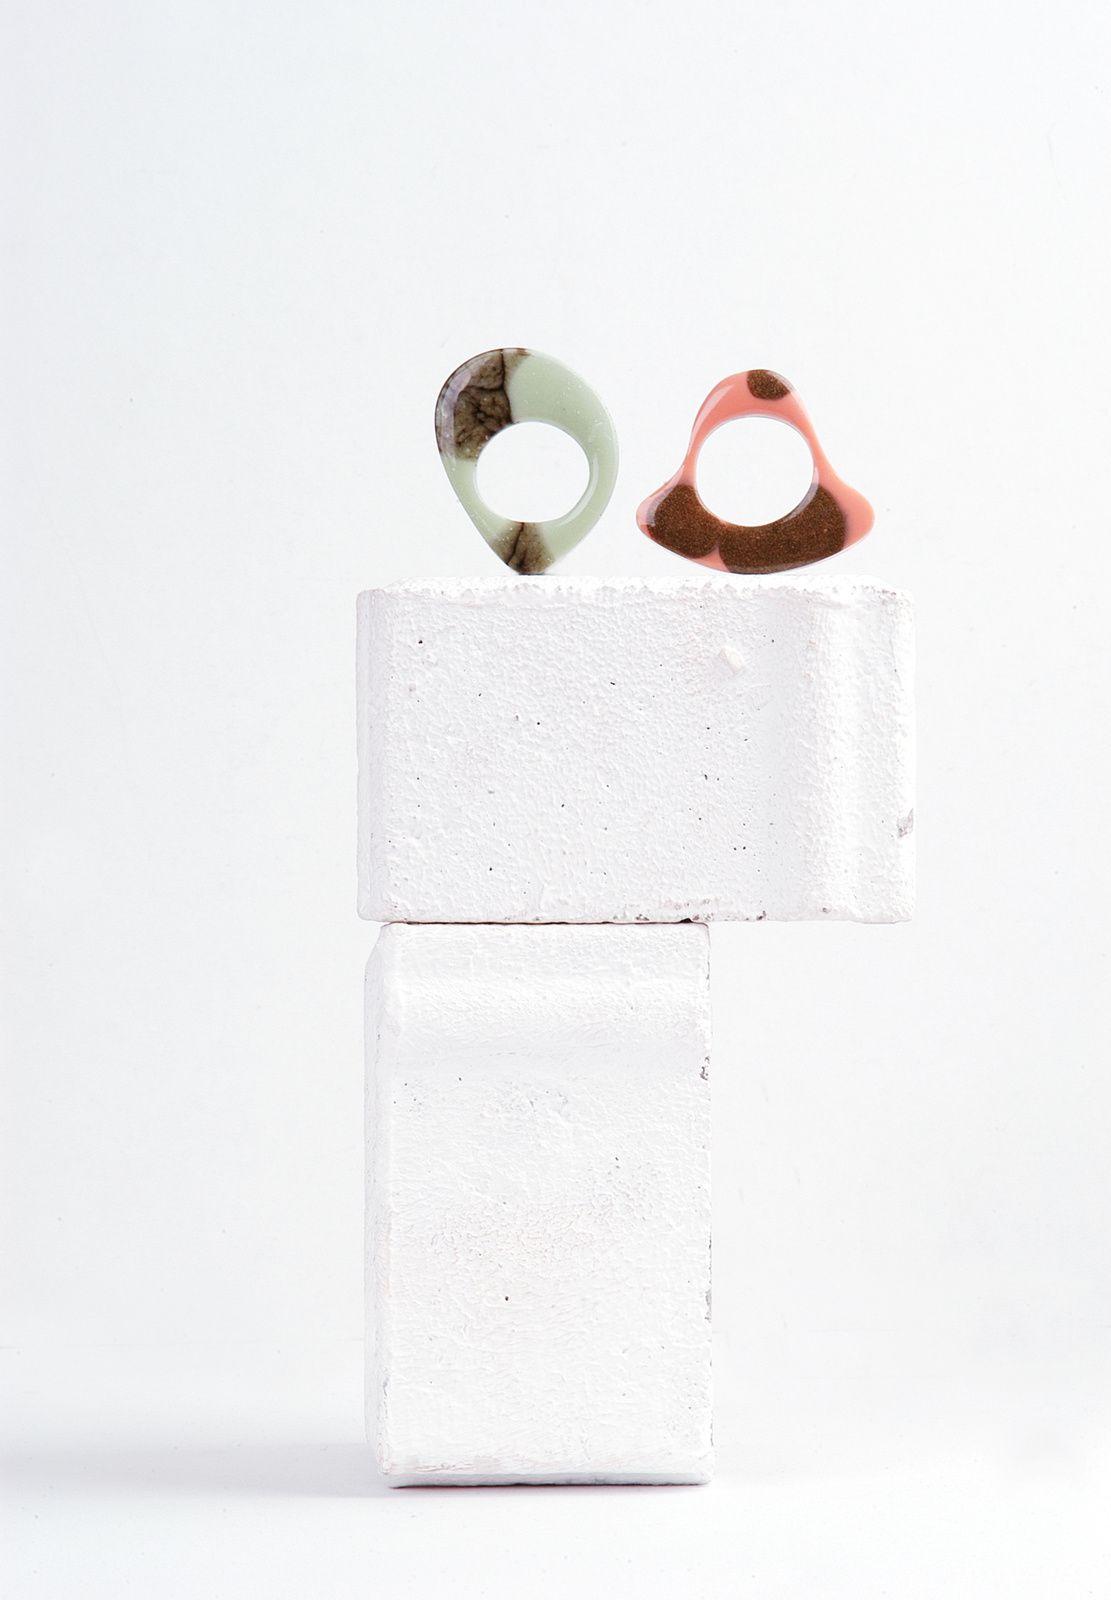 Big size resin rings